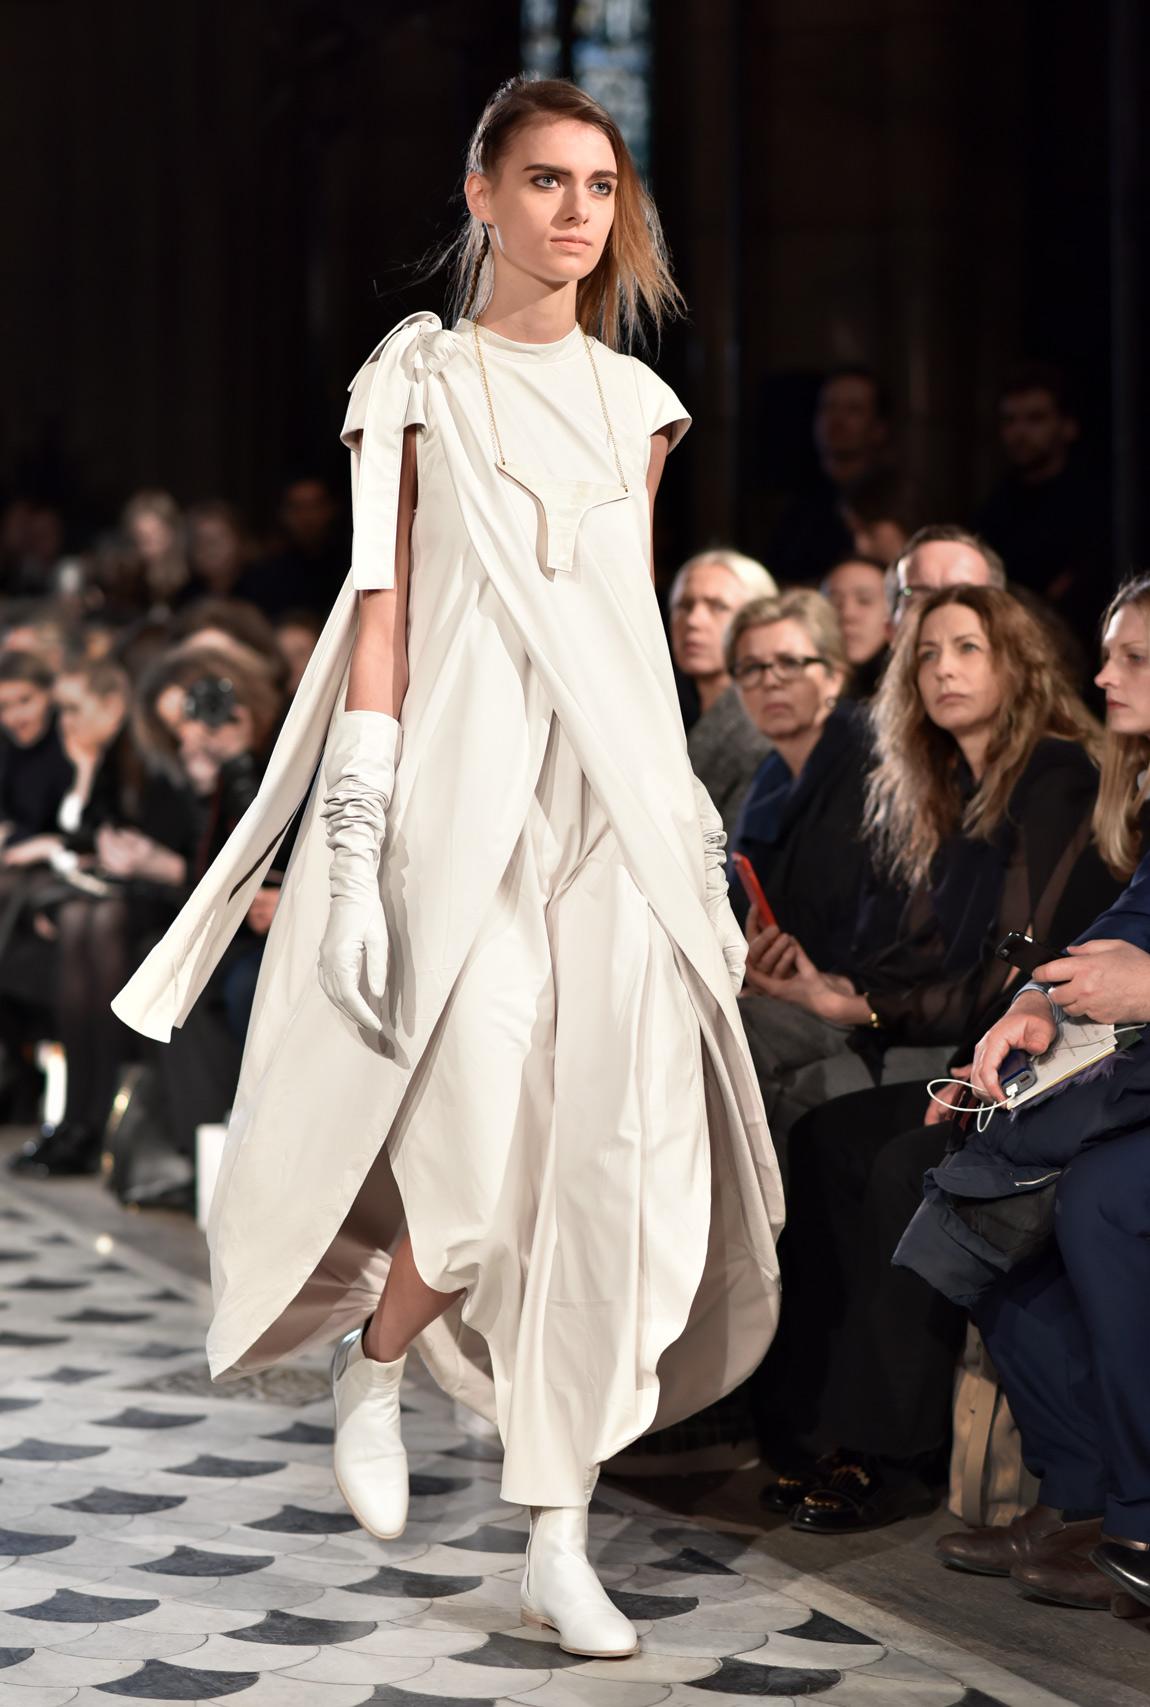 nobi talai, paris, fashionshow, allwhite, modenschau, laufsteg, runway, kollektion, modedesign, fashion, designer